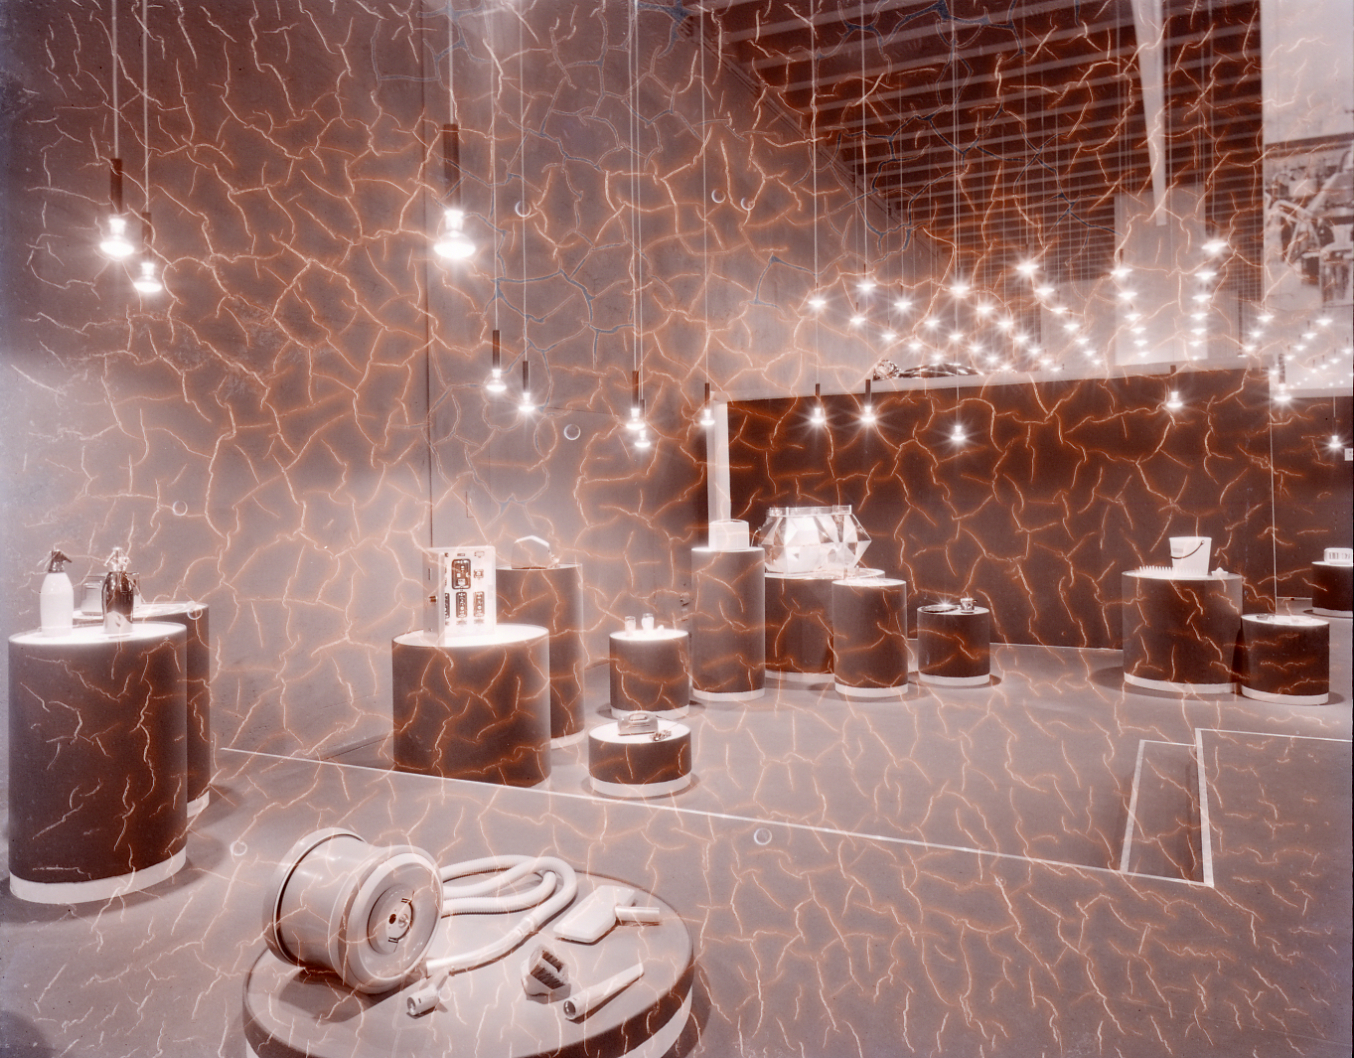 XI Triennale di Milano - Wikipedia